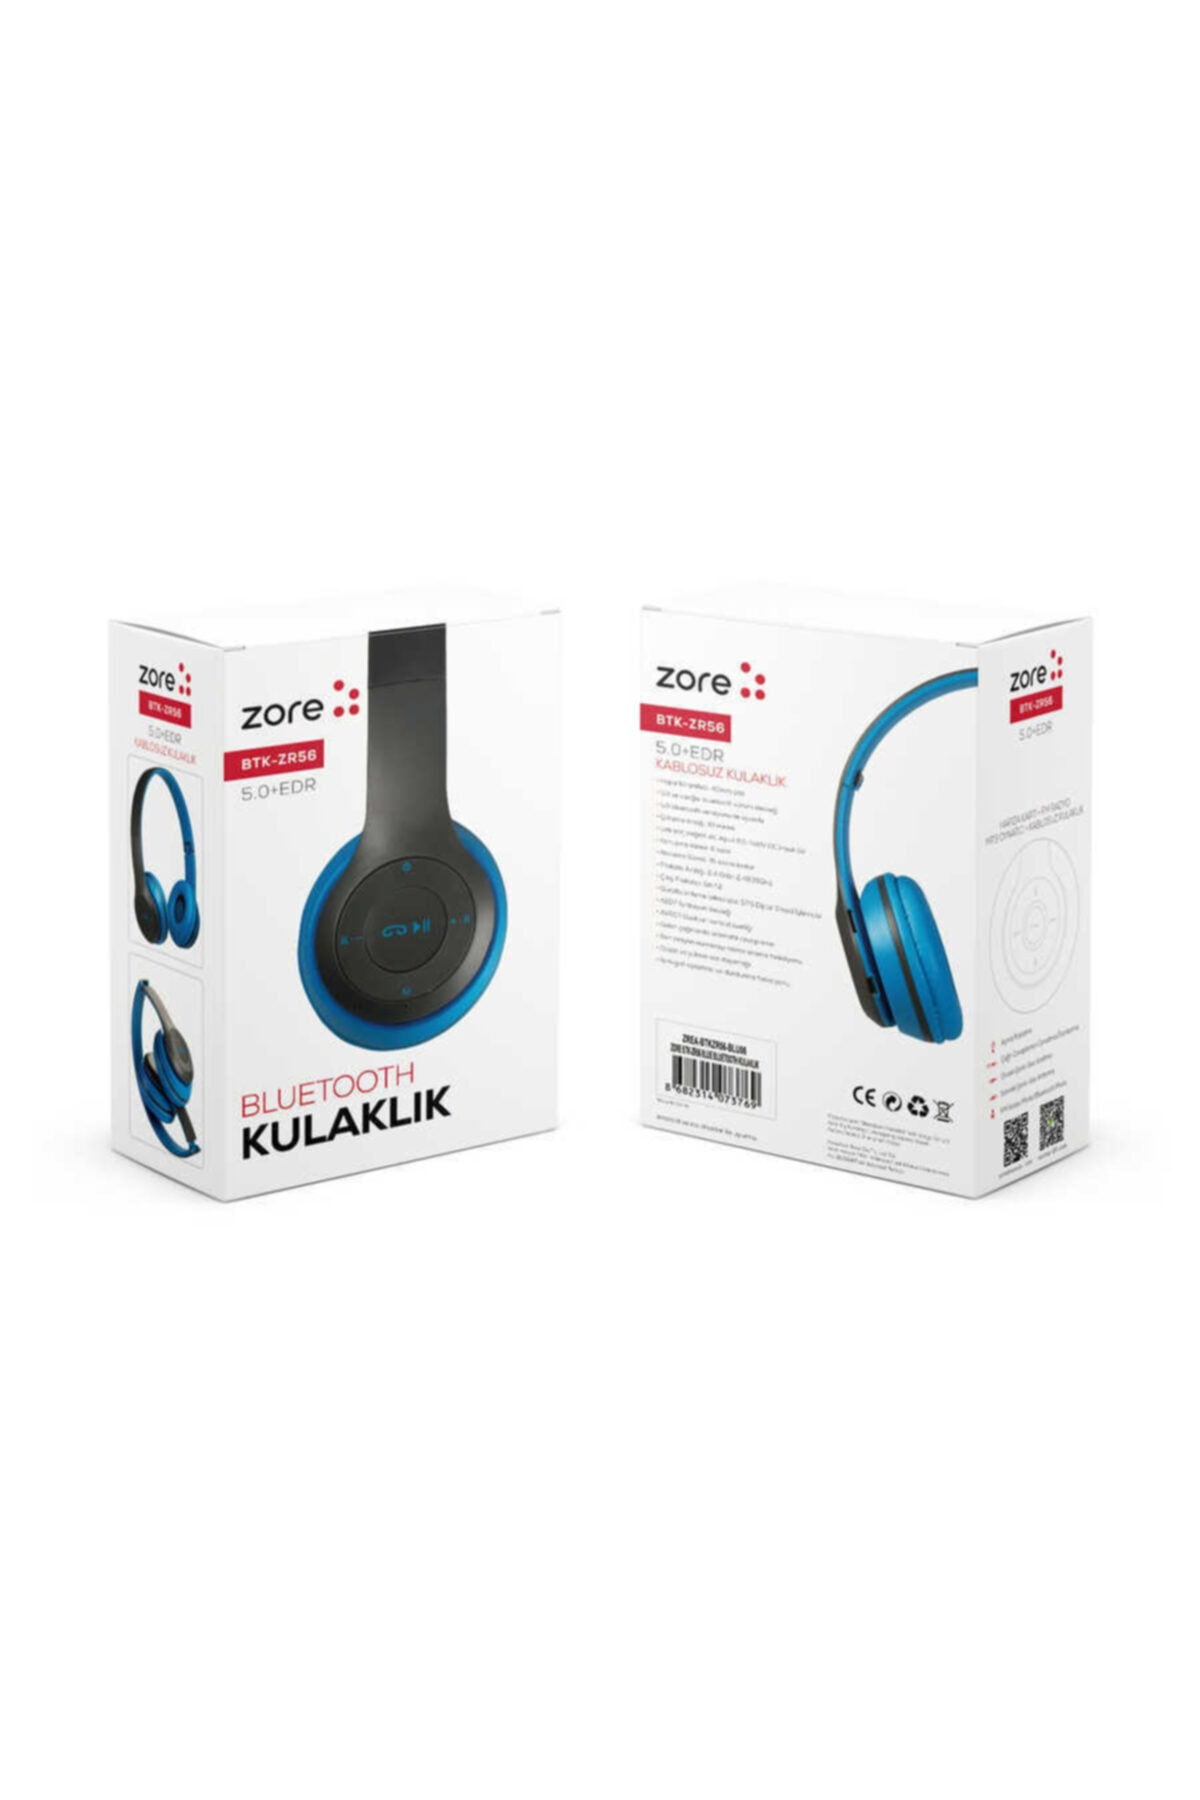 zore Bluetooth Kulaklık Kablosuz Müzik Oyuncu Kulaklığı Btk Serisi Head Phone 2